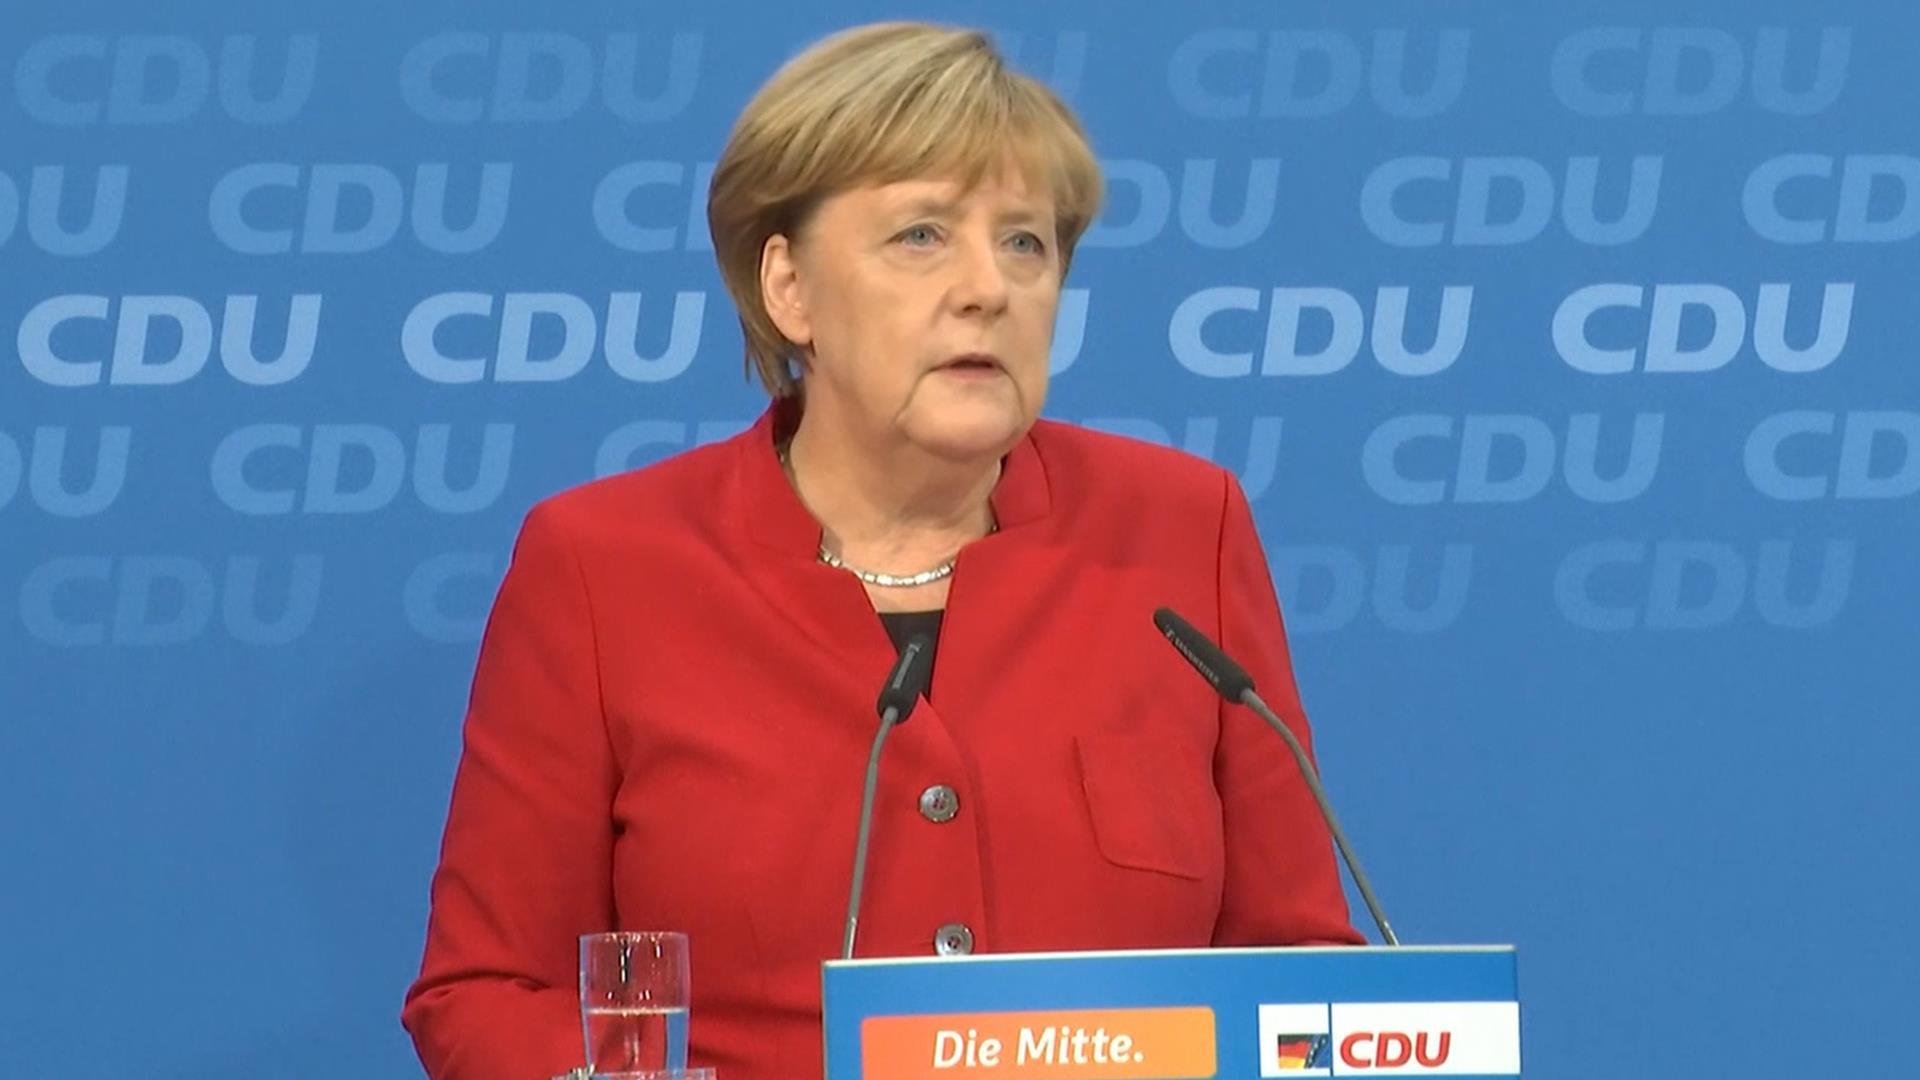 German Chancellor Angela Merkel Confirms Run For Fourth Term In Office